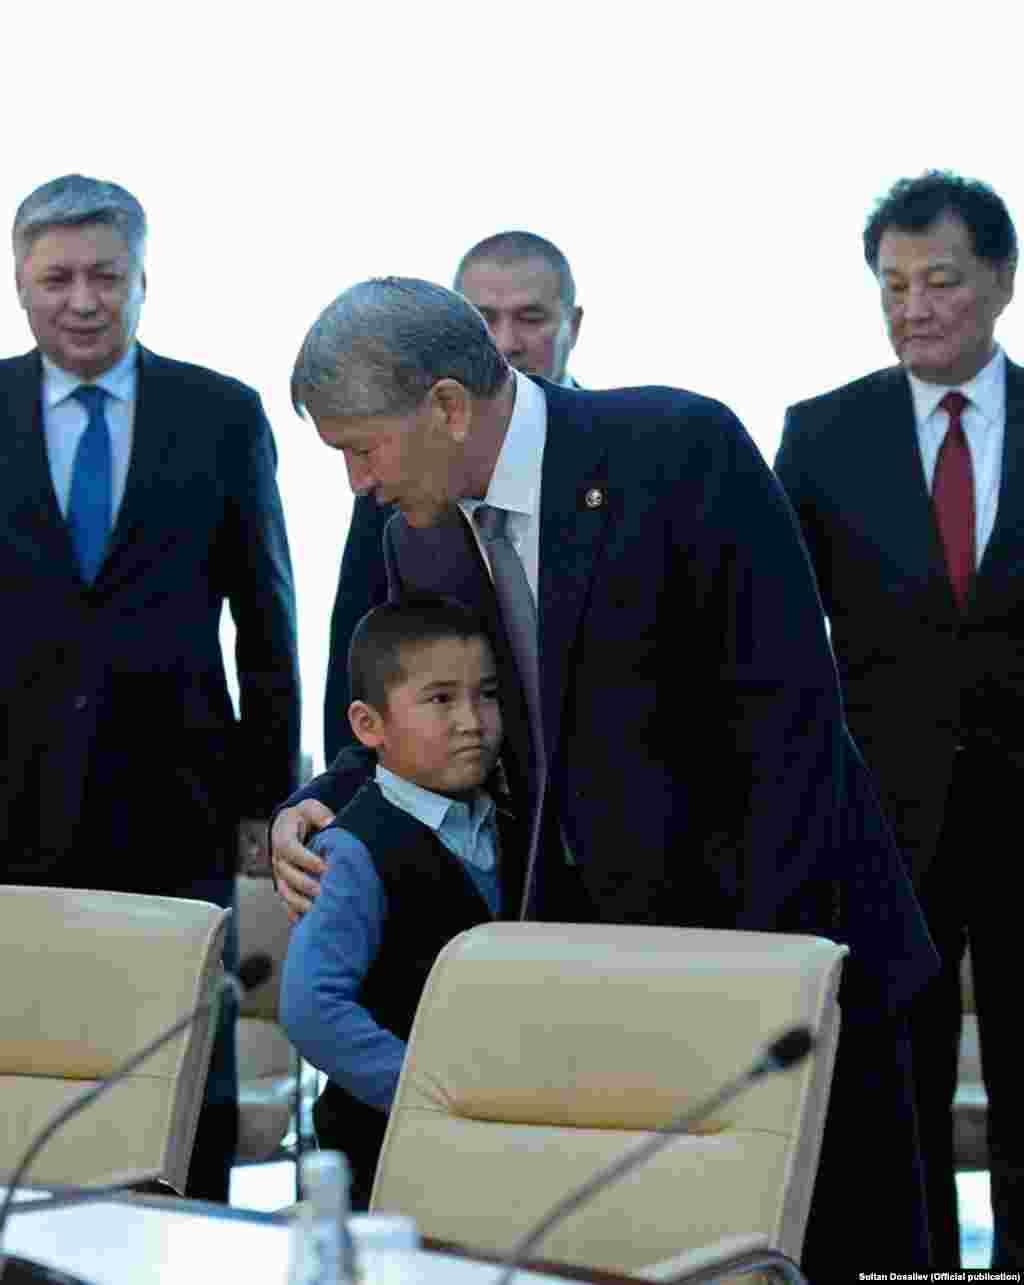 Kyrgyzstan - Bishkek - Atambaev meet with relatives - crash boing 747 - Dacha Su 26.01.2017